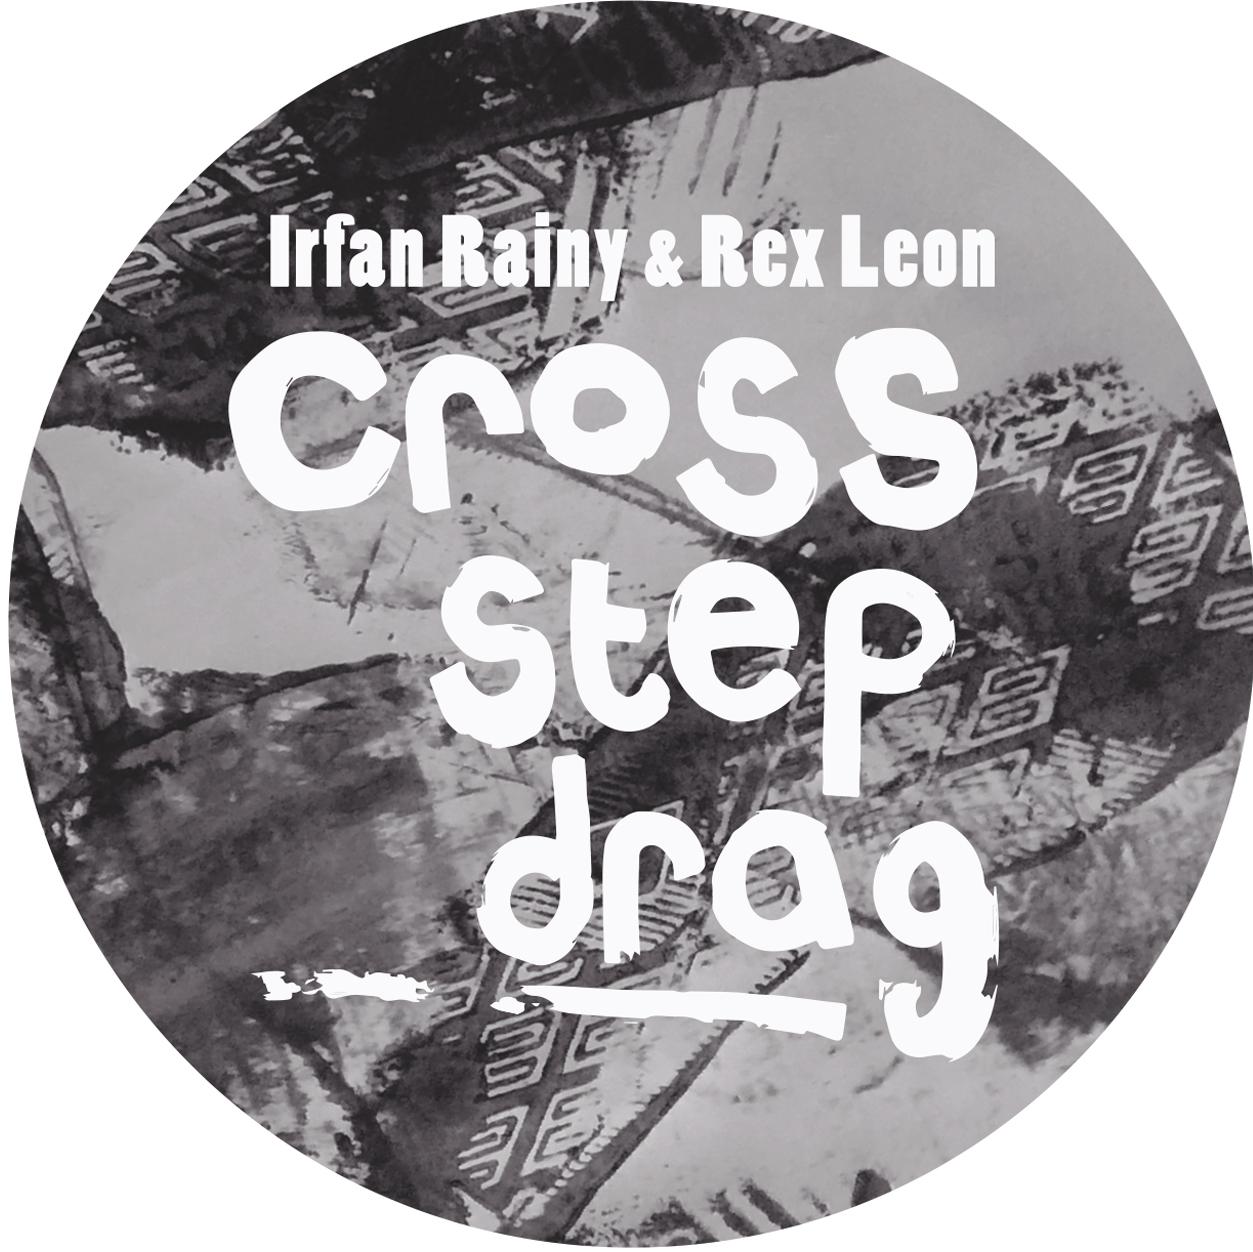 "Irfan Rainy & Rex Leon/CROSS STEP.. 12"""